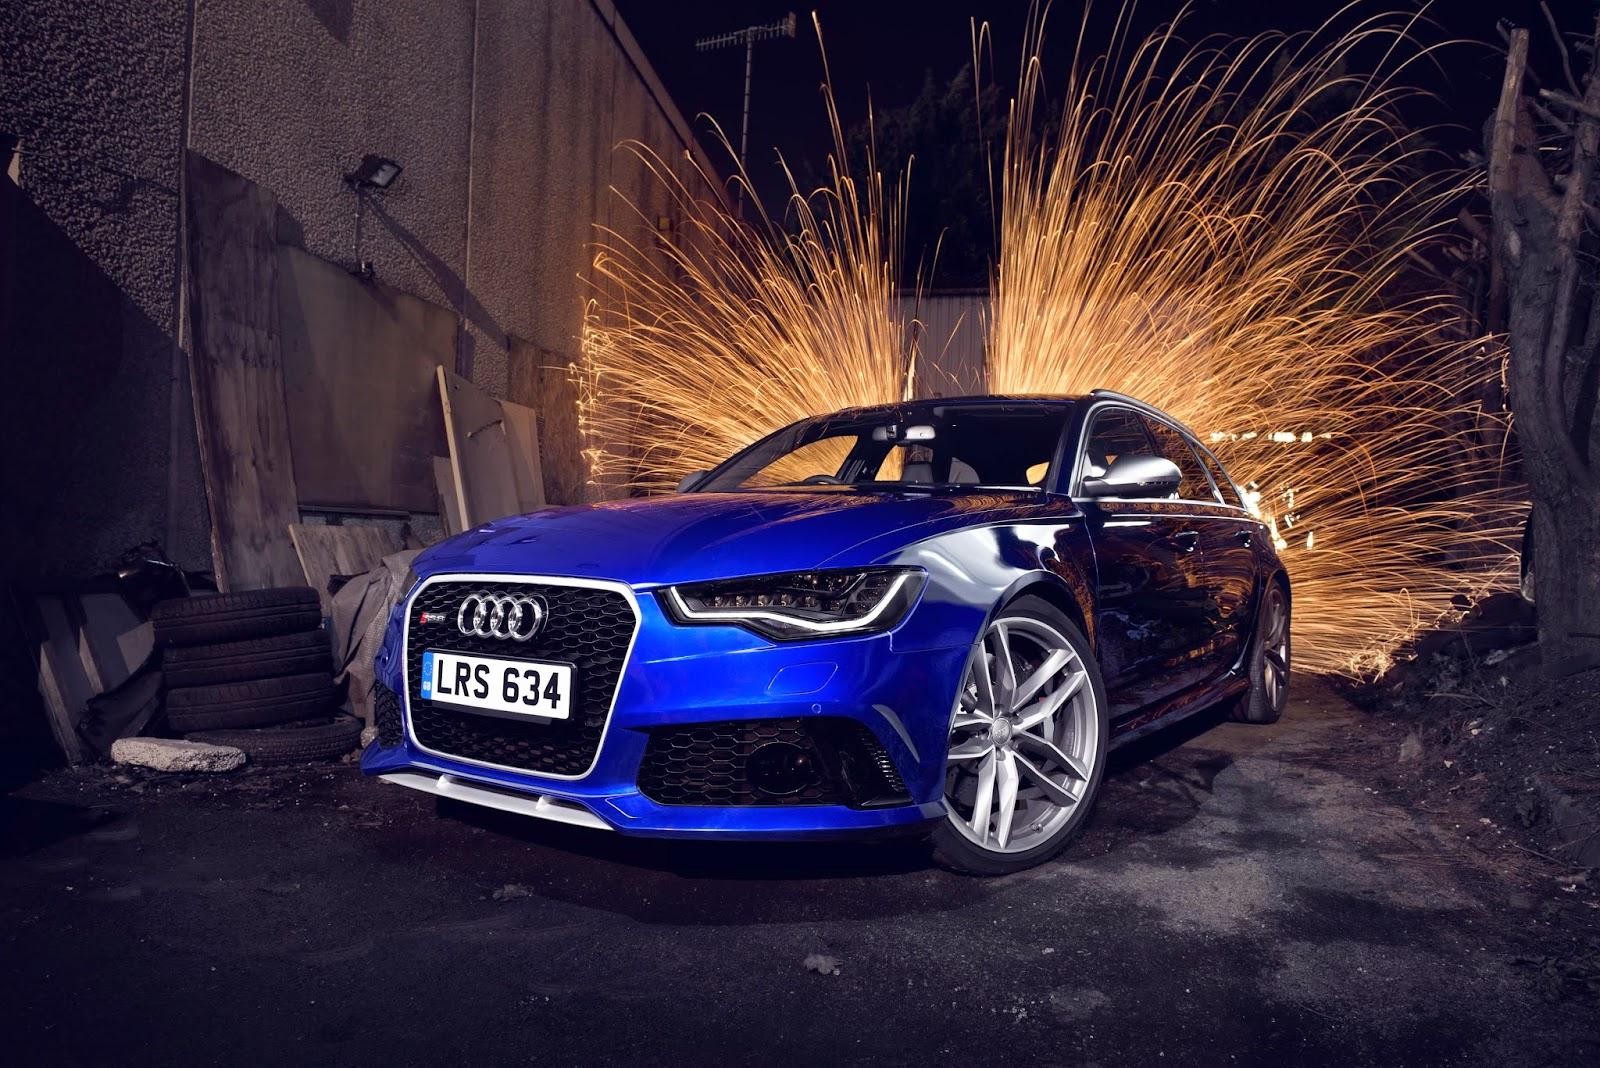 Blue Audi RS6 Avant